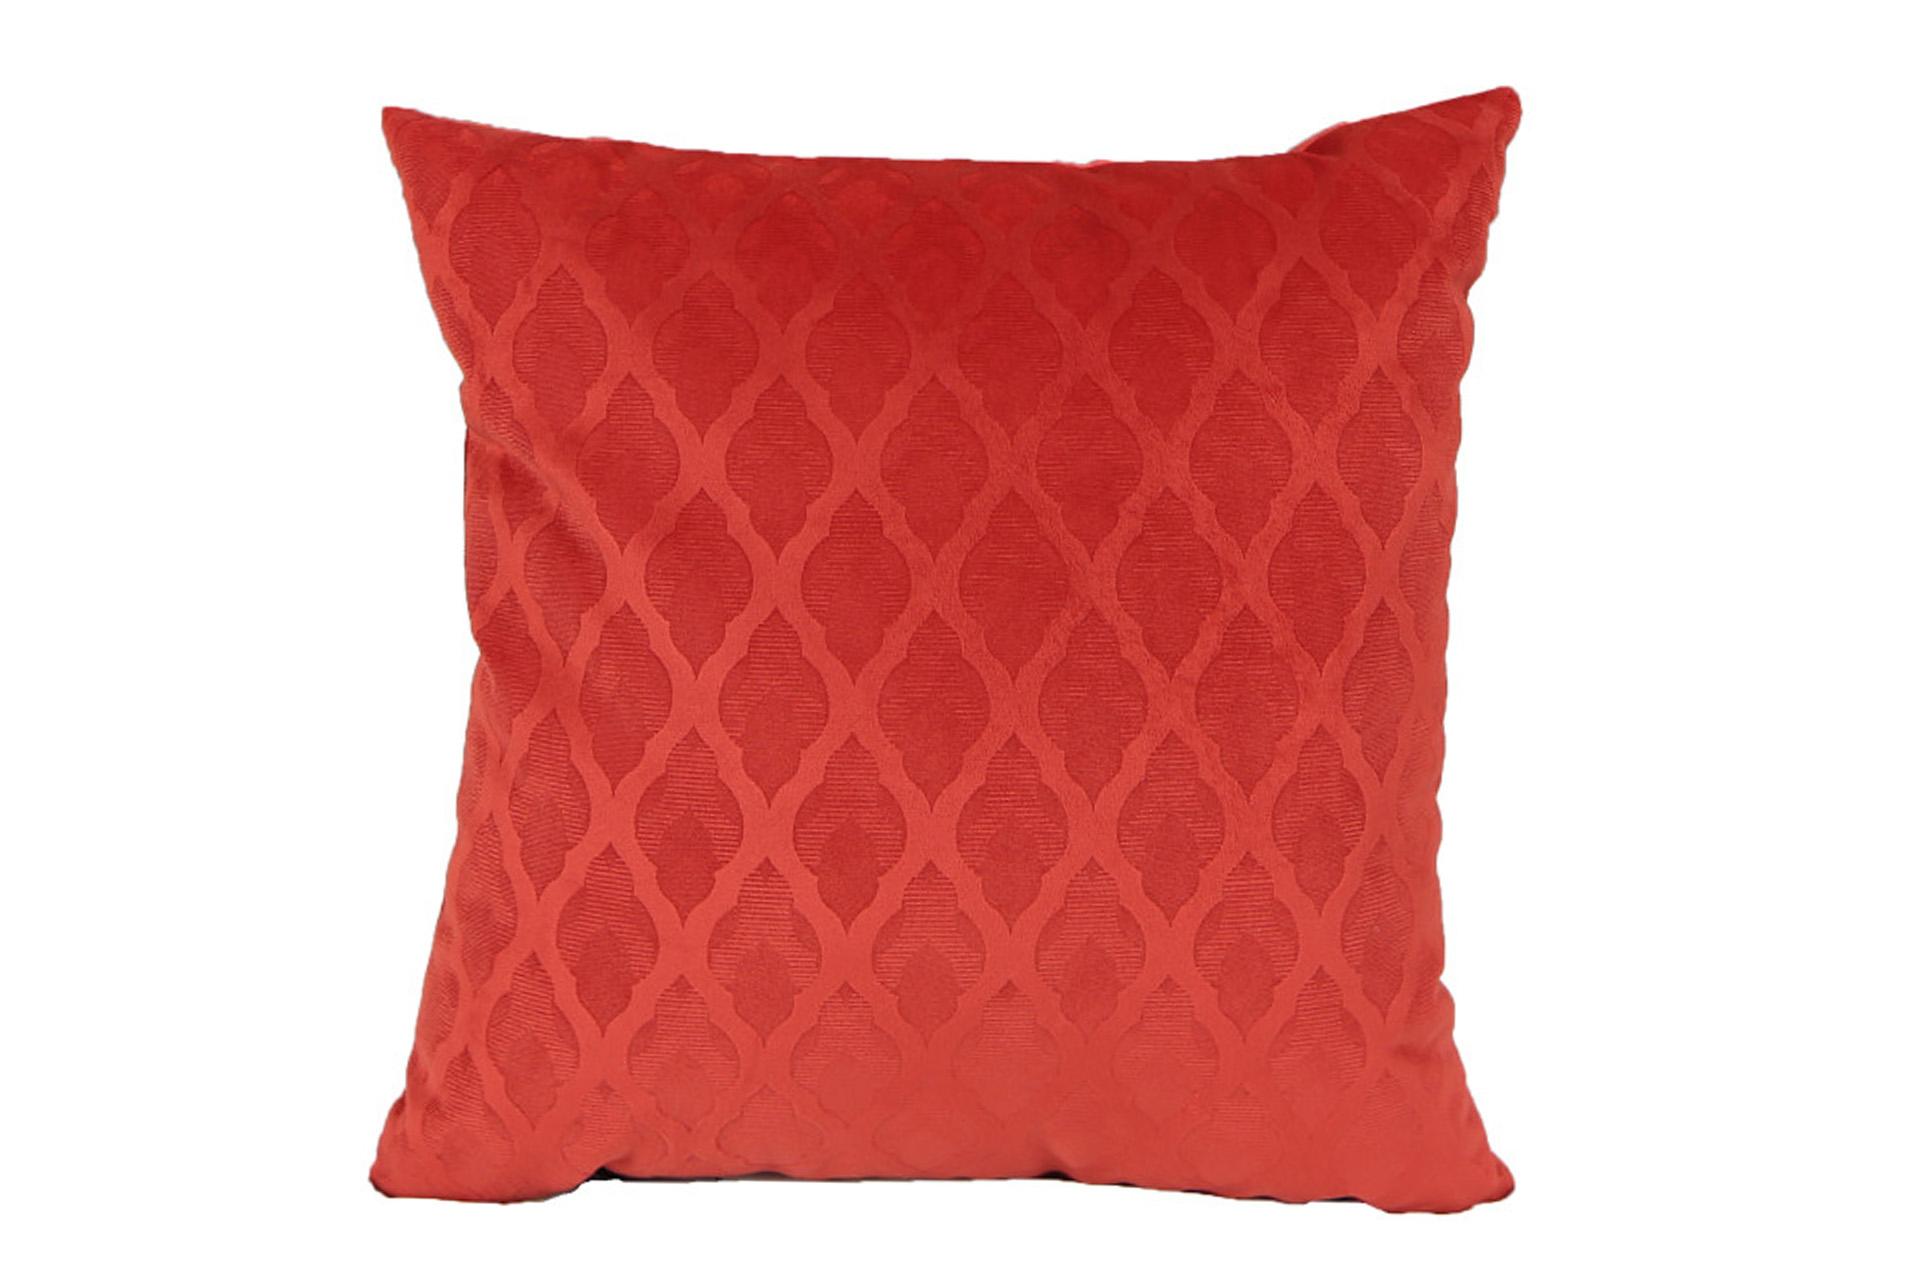 Accent Pillow Red Velvet Diamonds 18x18 Living Spaces